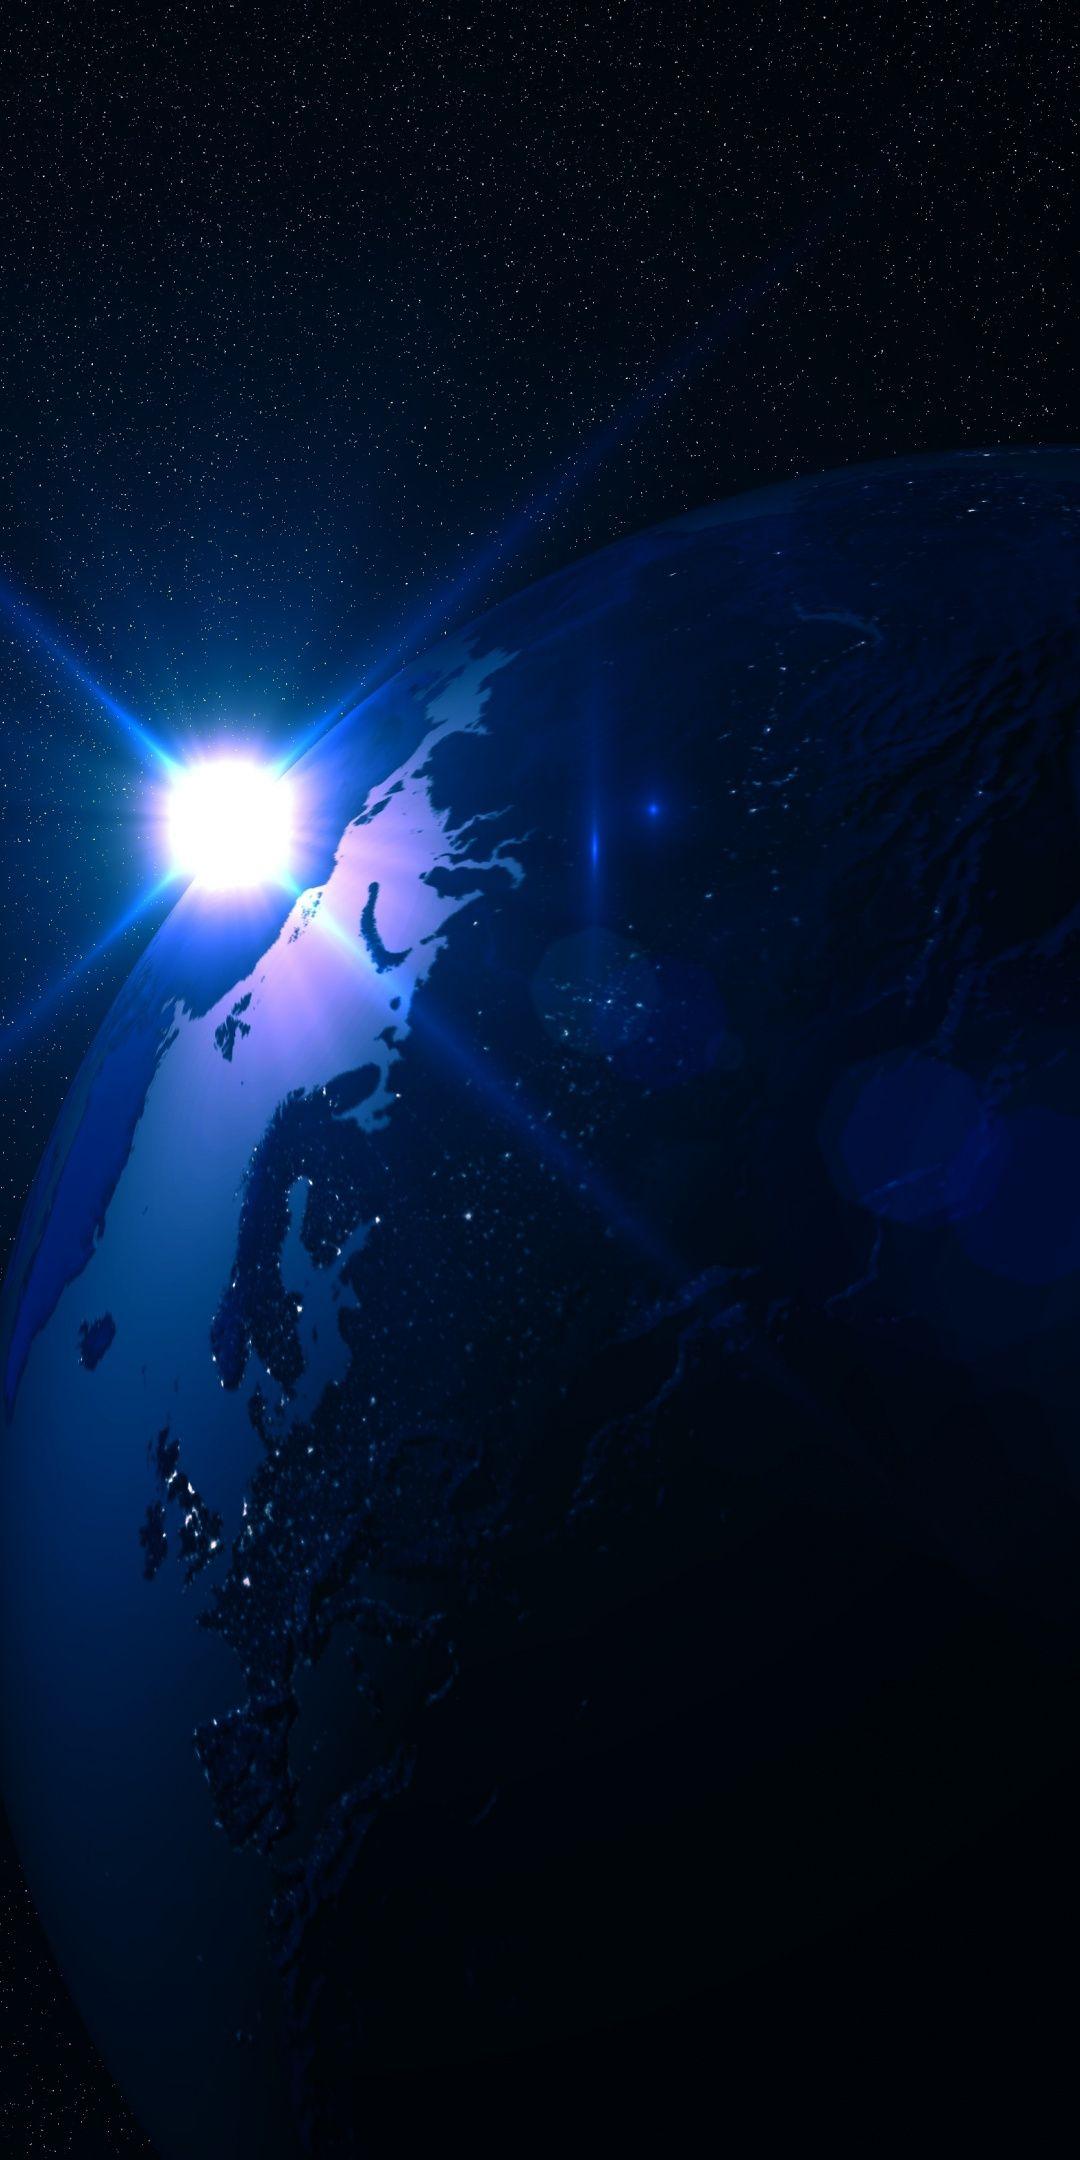 Planet Star Shine Dark Space 1080x2160 Wallpaper Planets Wallpaper Background